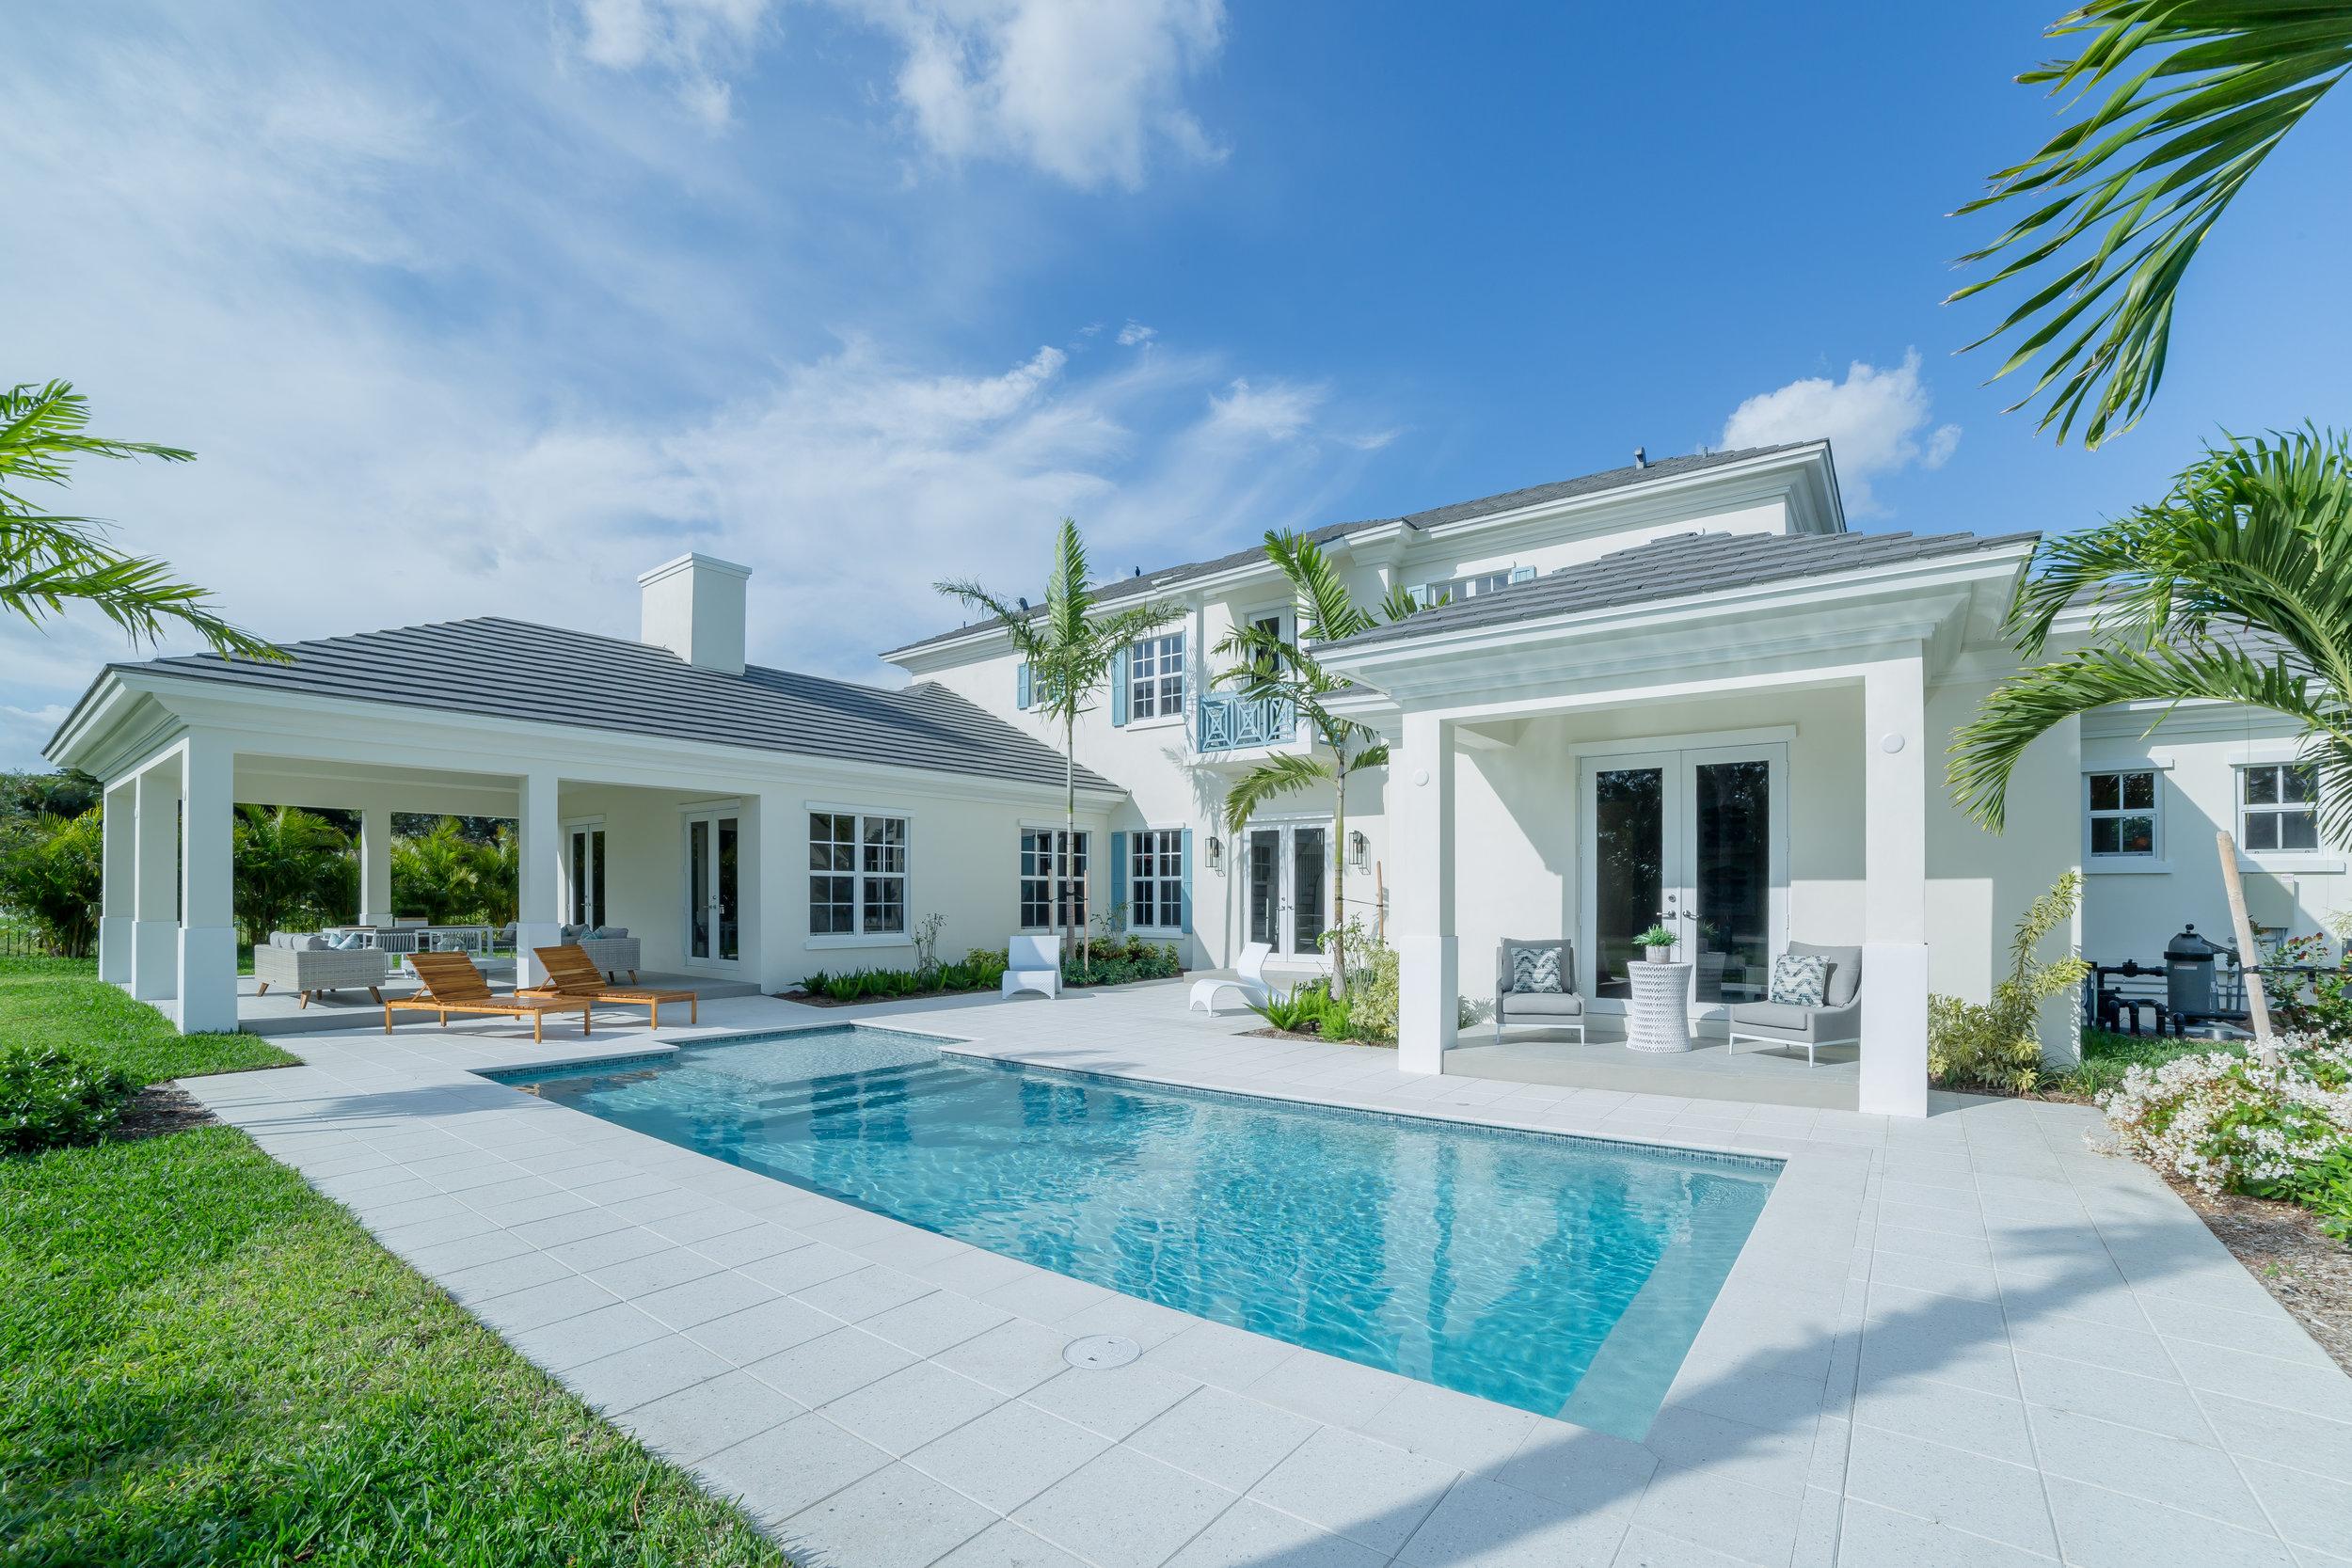 Custom Home | Delray Beach, FL  4 Beds | 4.5 Baths |4,900 SF  Architect |Richard Jones  Interior Designer | Leighton Design Group   View Project